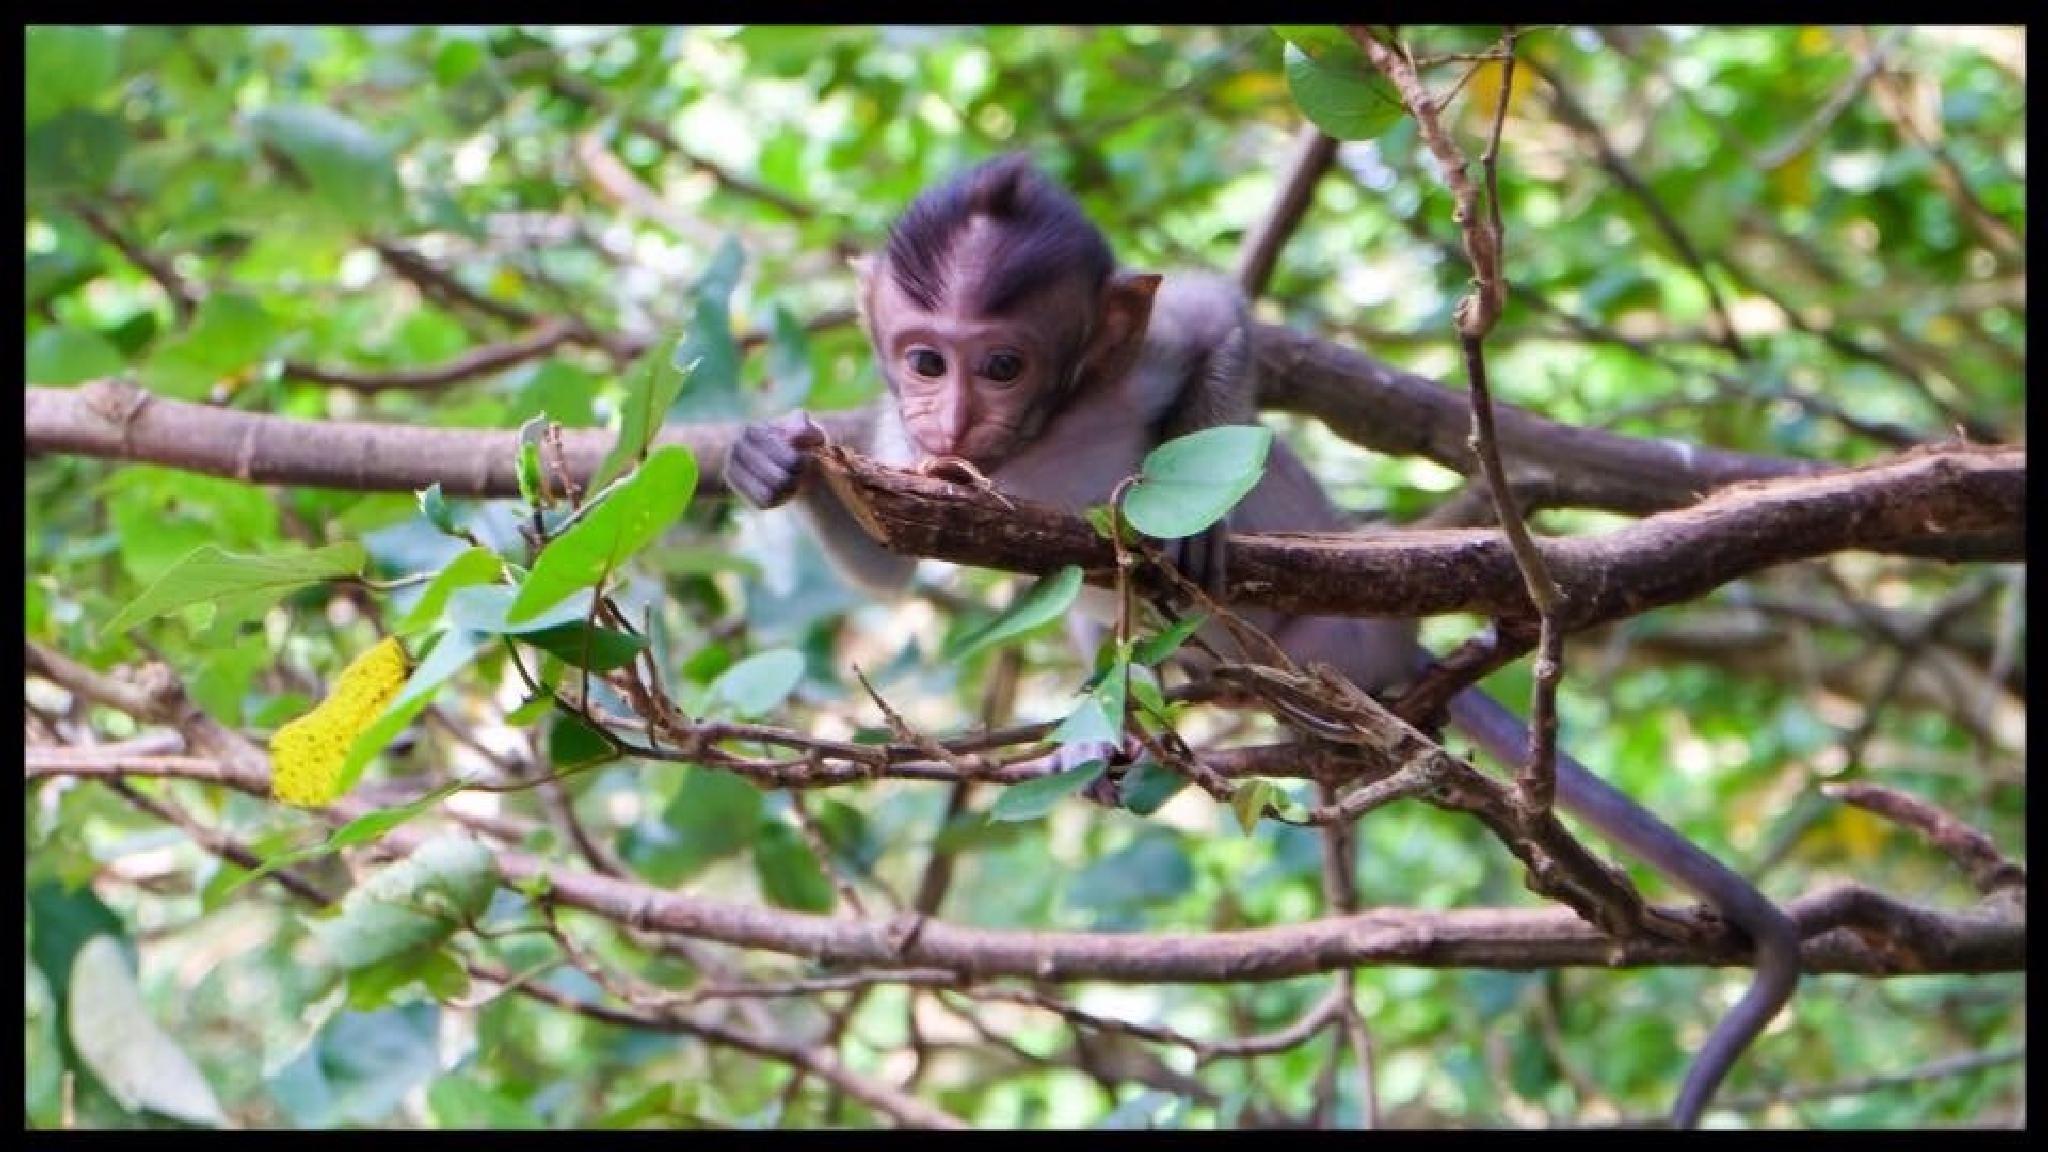 Cheeky Monkey by Magda Swiba